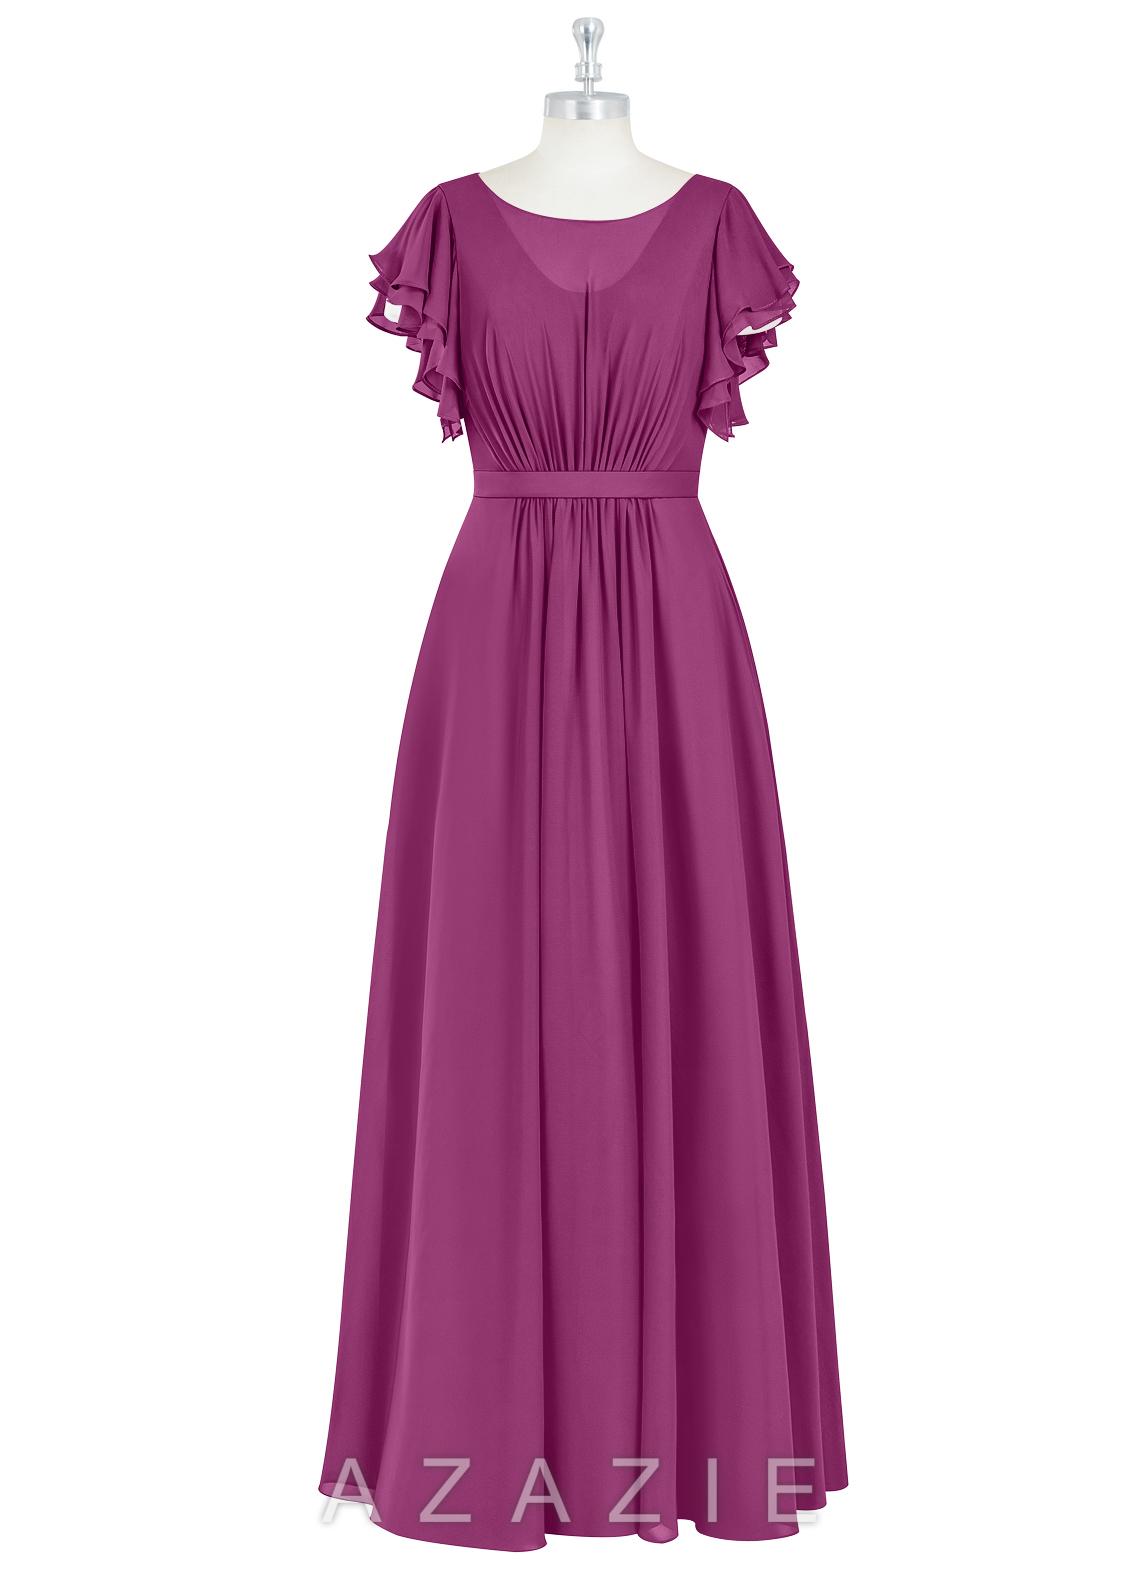 5b15712c85 Azazie Daphne Modest Bridesmaid Dresses